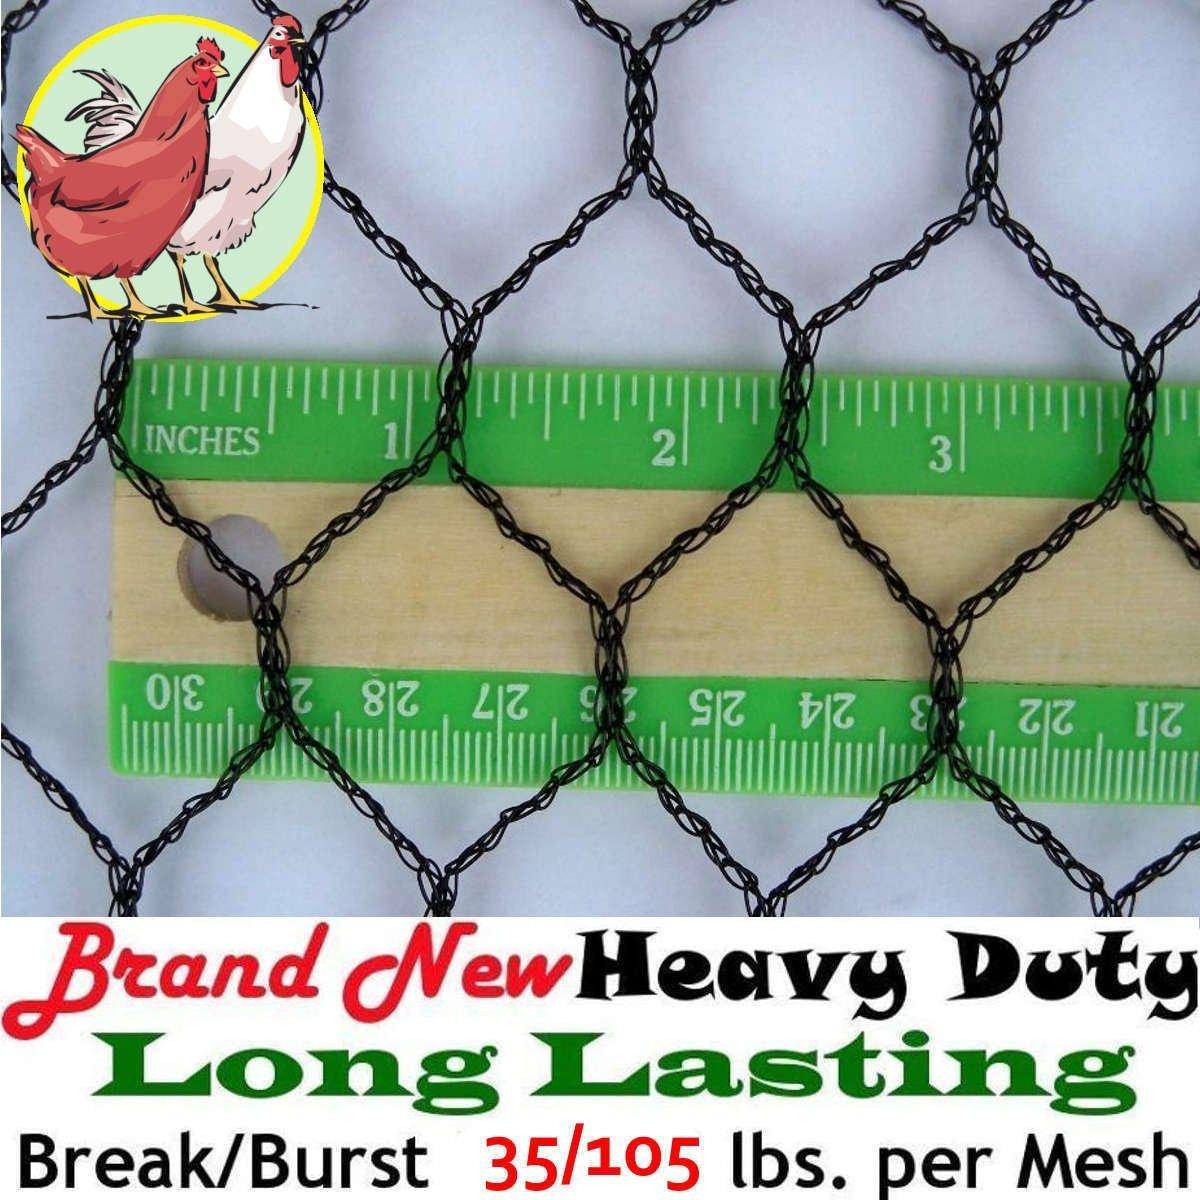 1'' Light Knitted Netting (6' X 100') Poultry Plant Bird Aviary Fruit Garden Protection Net Nets - Break/Burst: 35/105 lbs. per mesh by Pinnon Hatch Farms